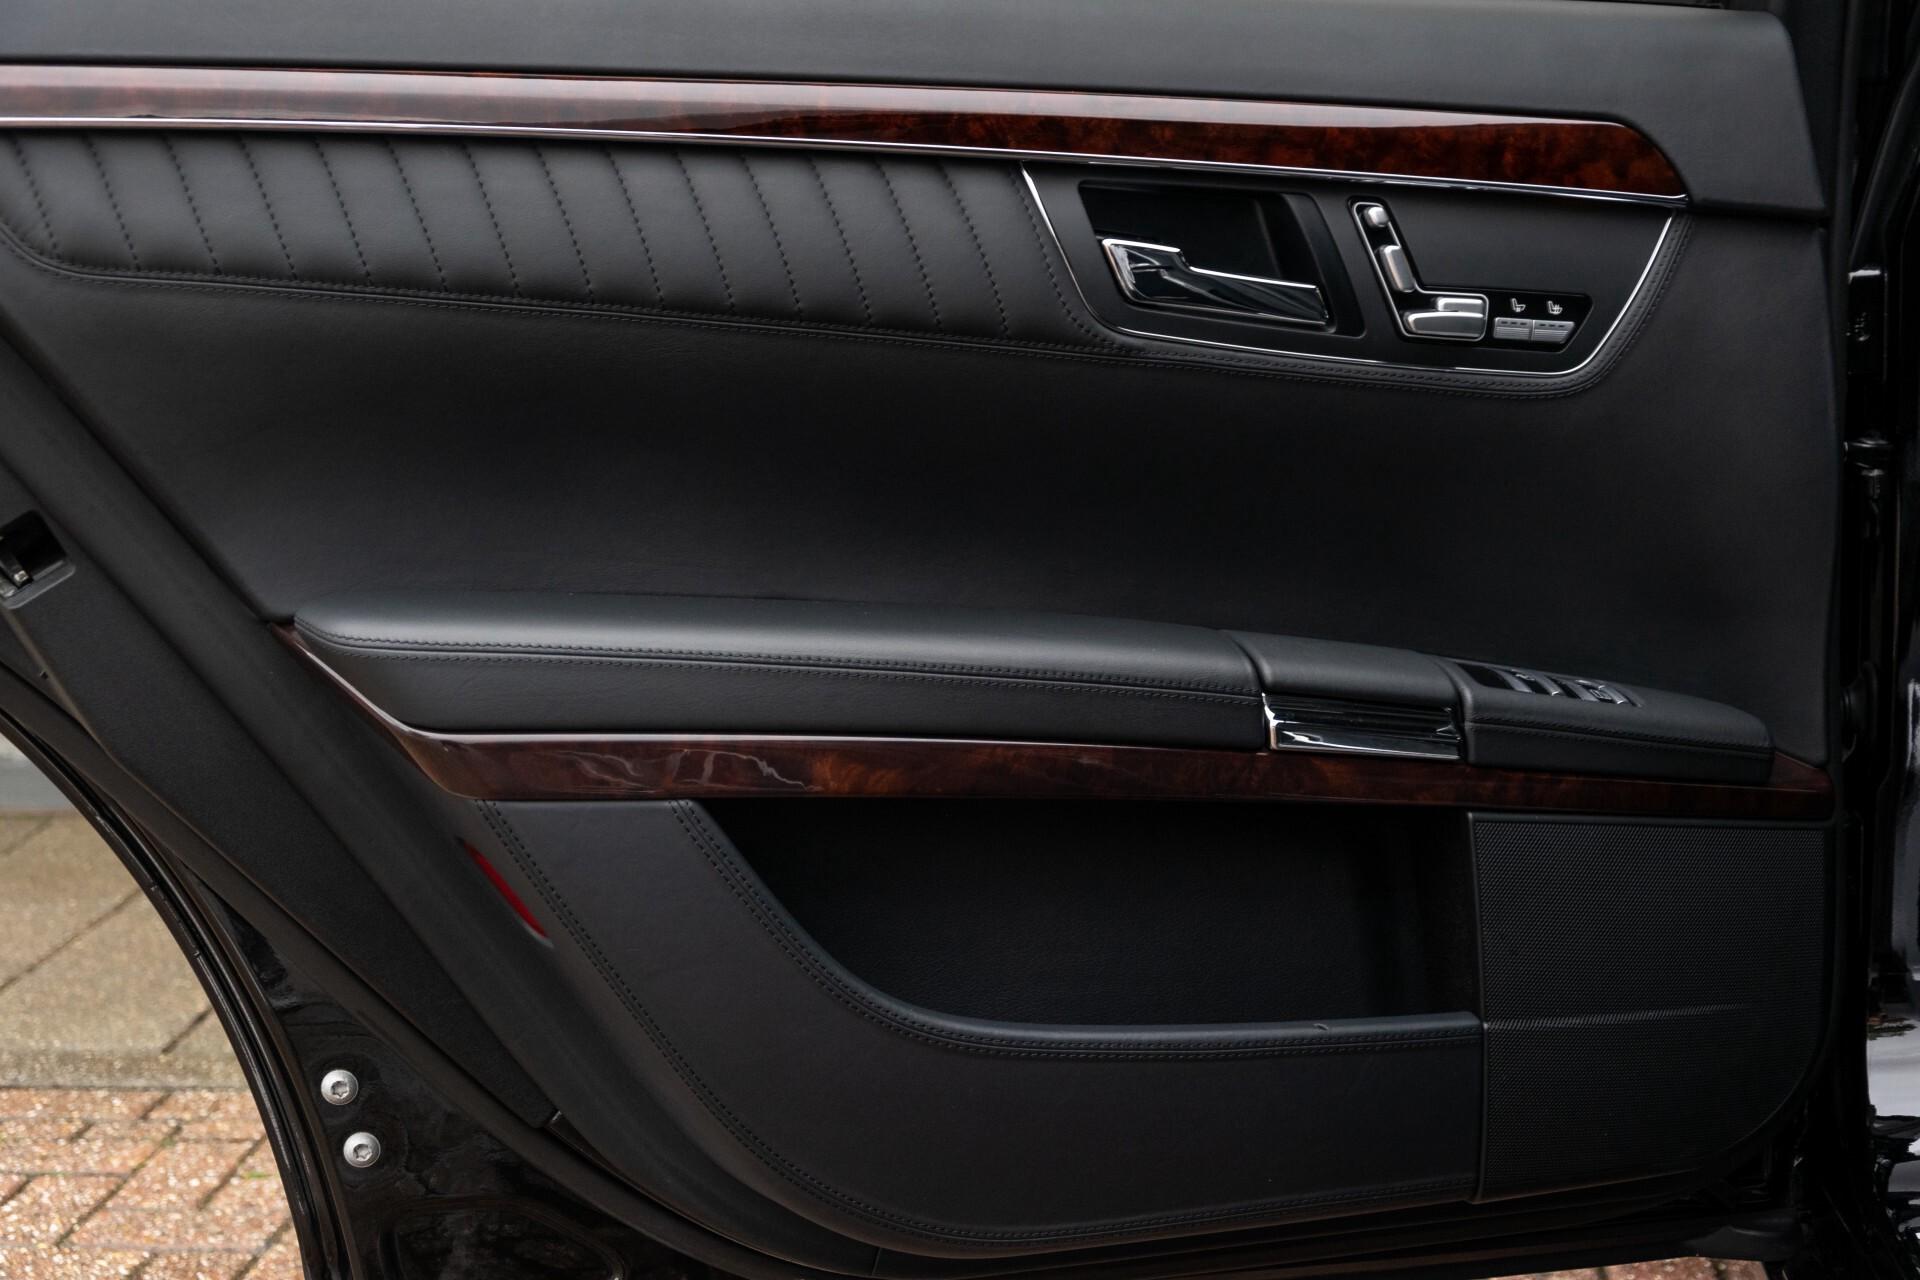 Mercedes-Benz S-Klasse 600 Lang 65 AMG Bi-Turbo Prestige Plus Aut5 Foto 57